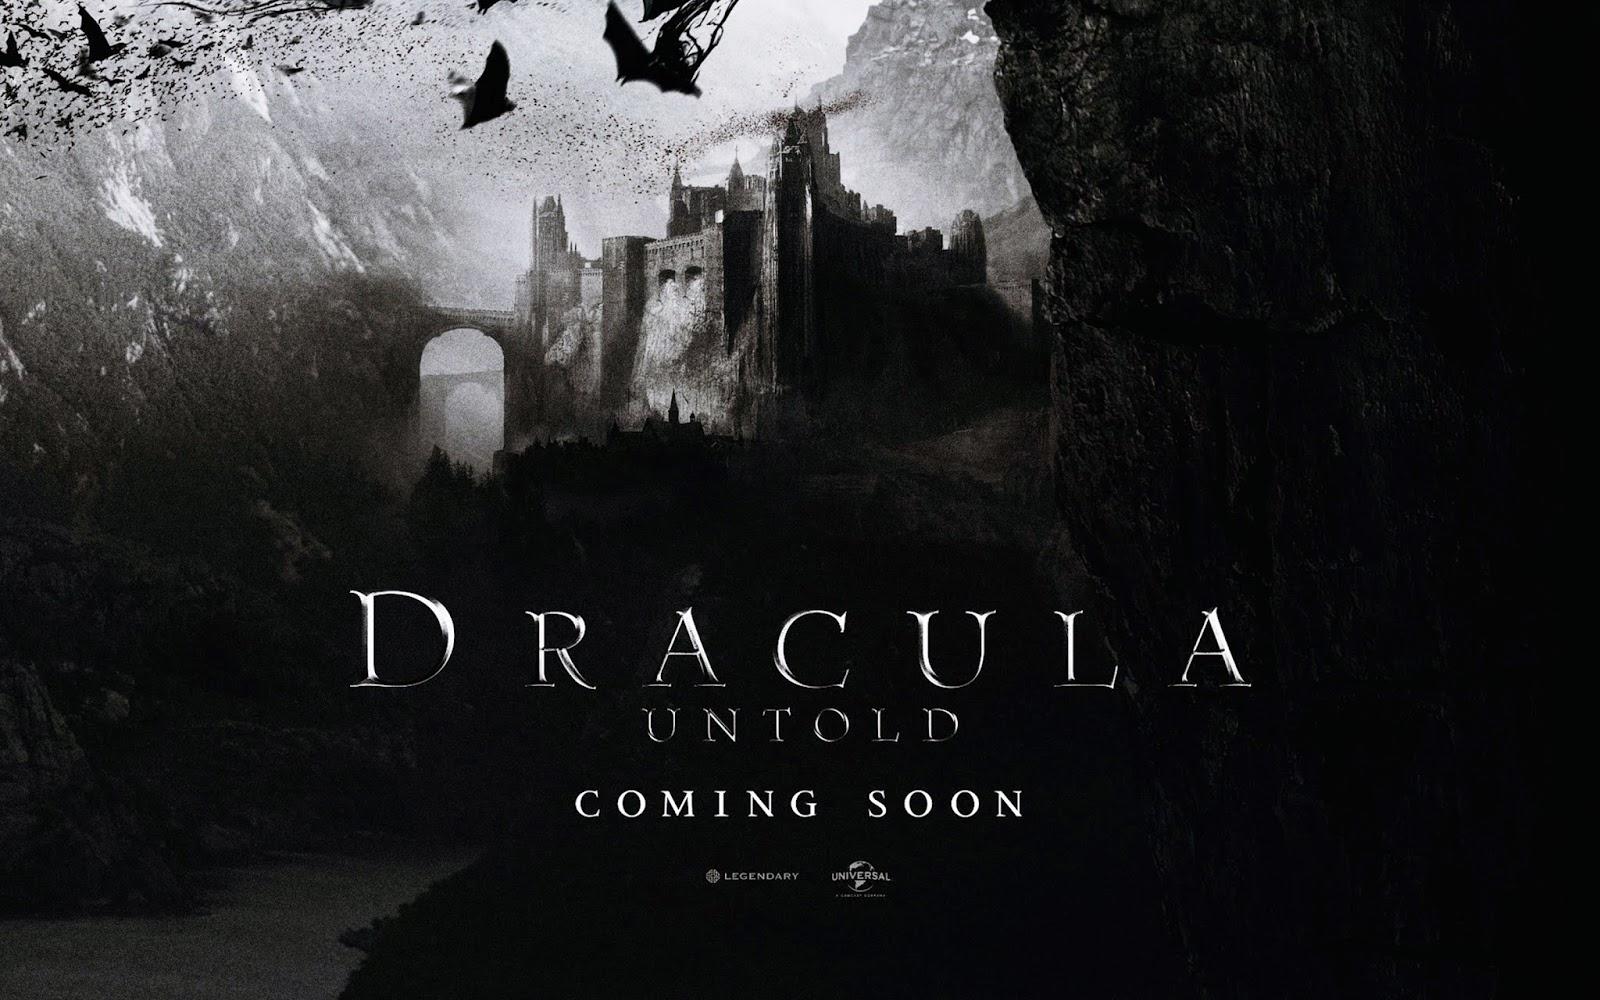 der feldmarschall dracula untold finally another epic